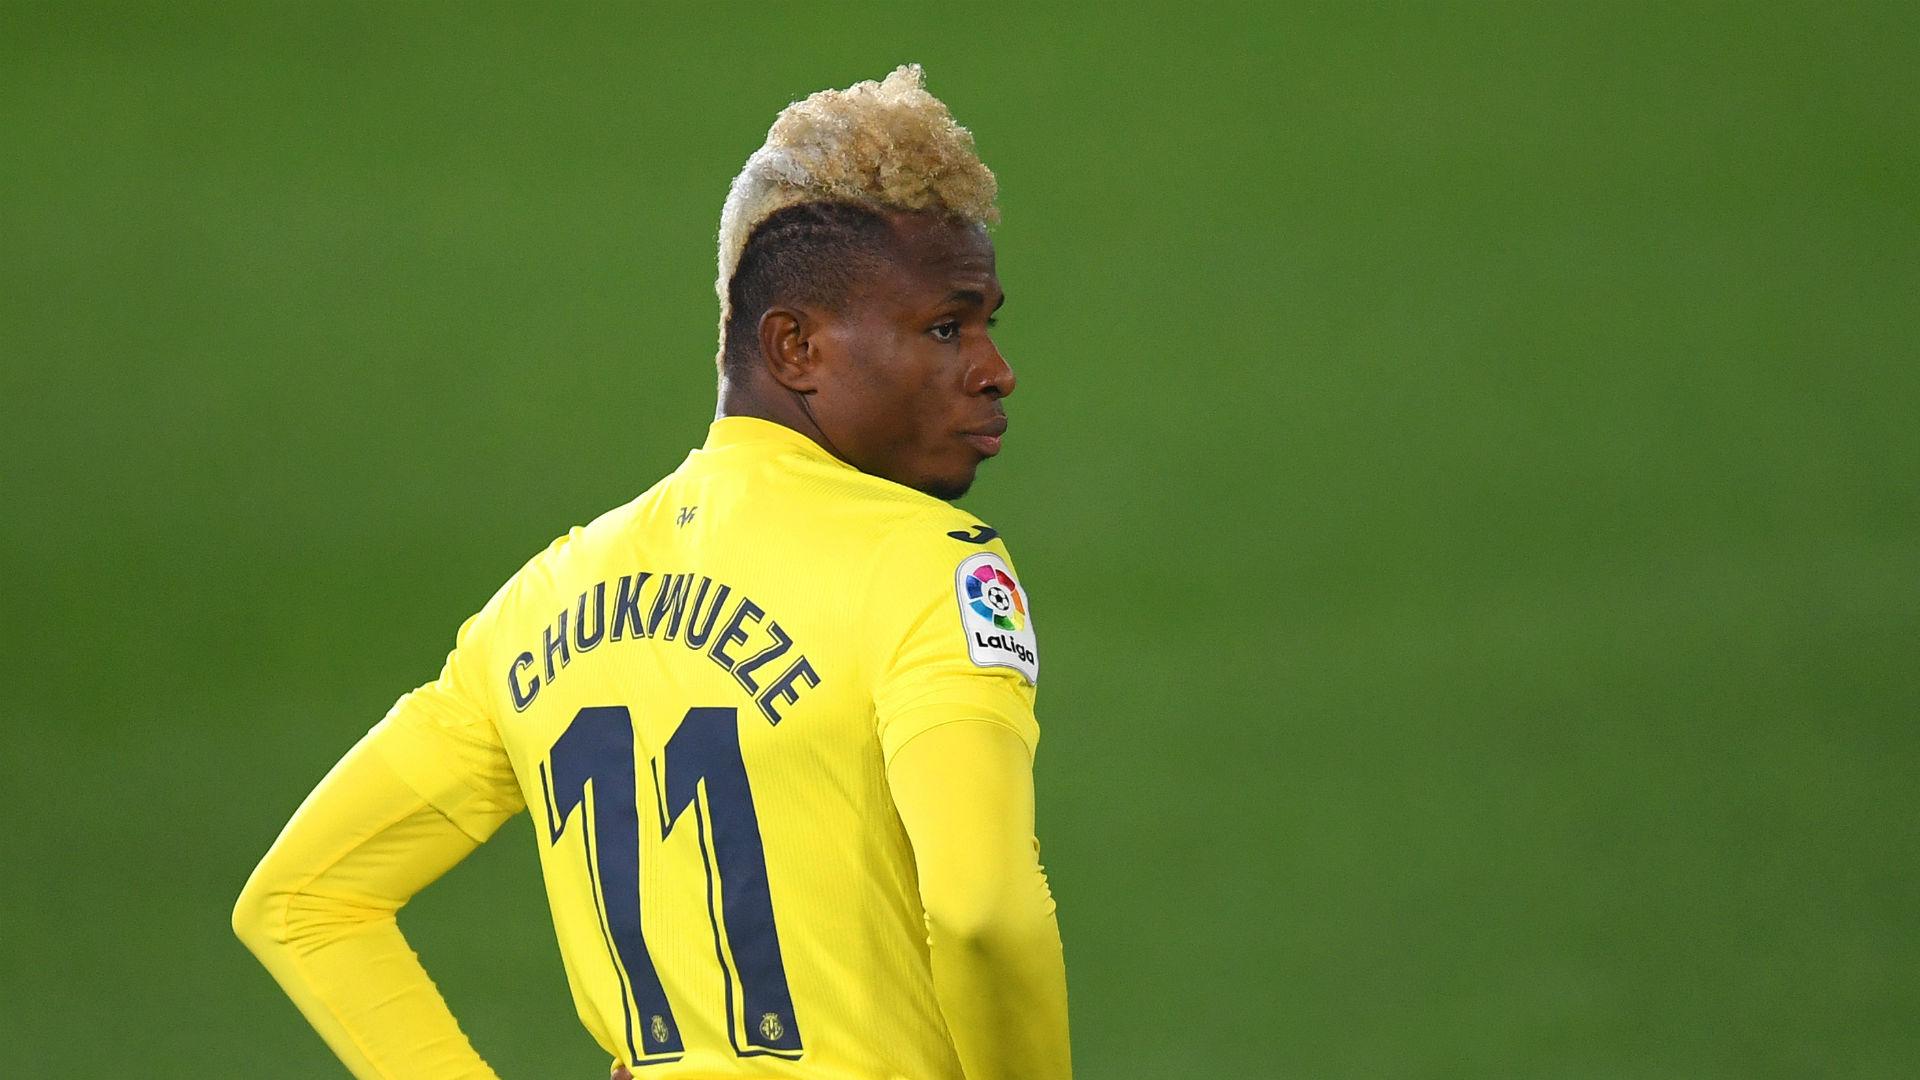 Samuel Chukwueze becomes youngest Villarreal centurion   Goal.com